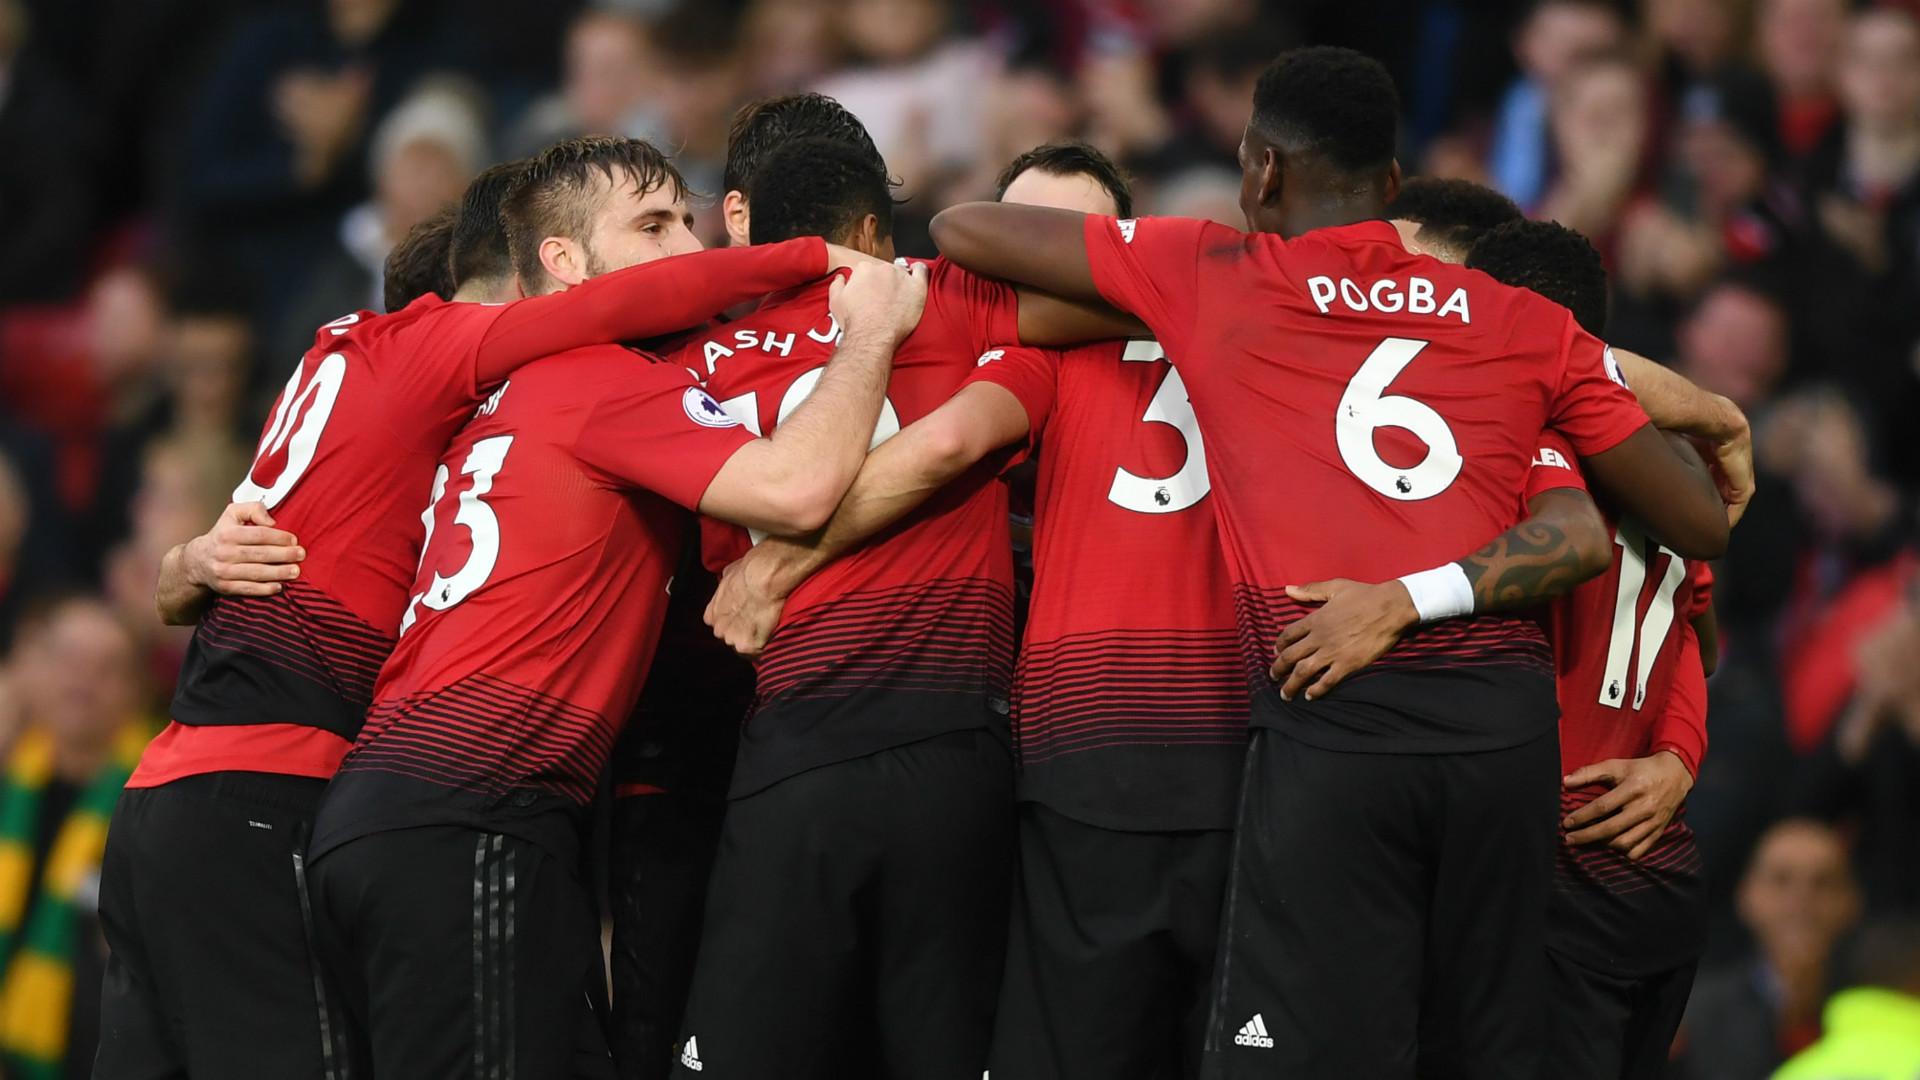 Berita Manchester United Ole Gunnar Solskjaer Ini Baru